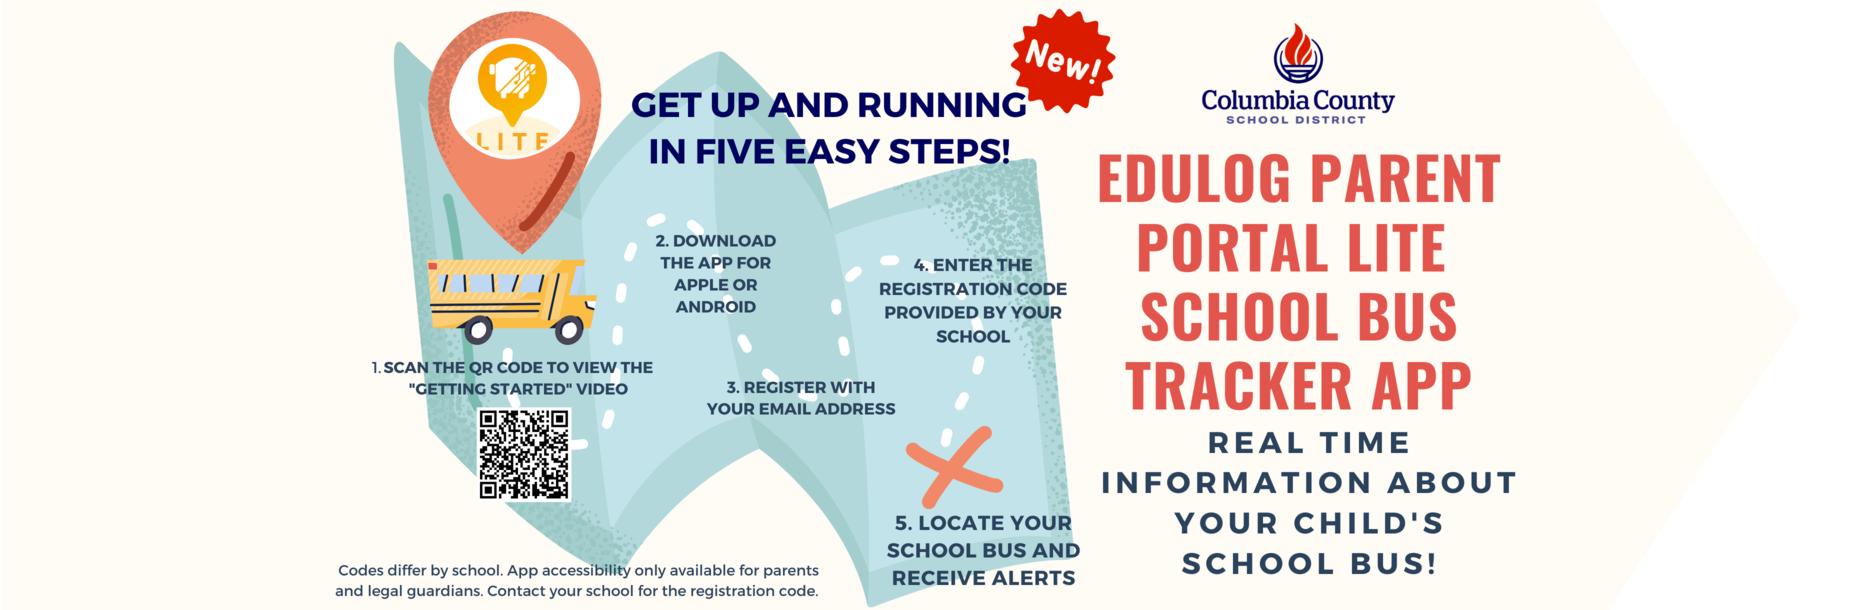 Edulog Parent Portal Lite School bus tracking app directions